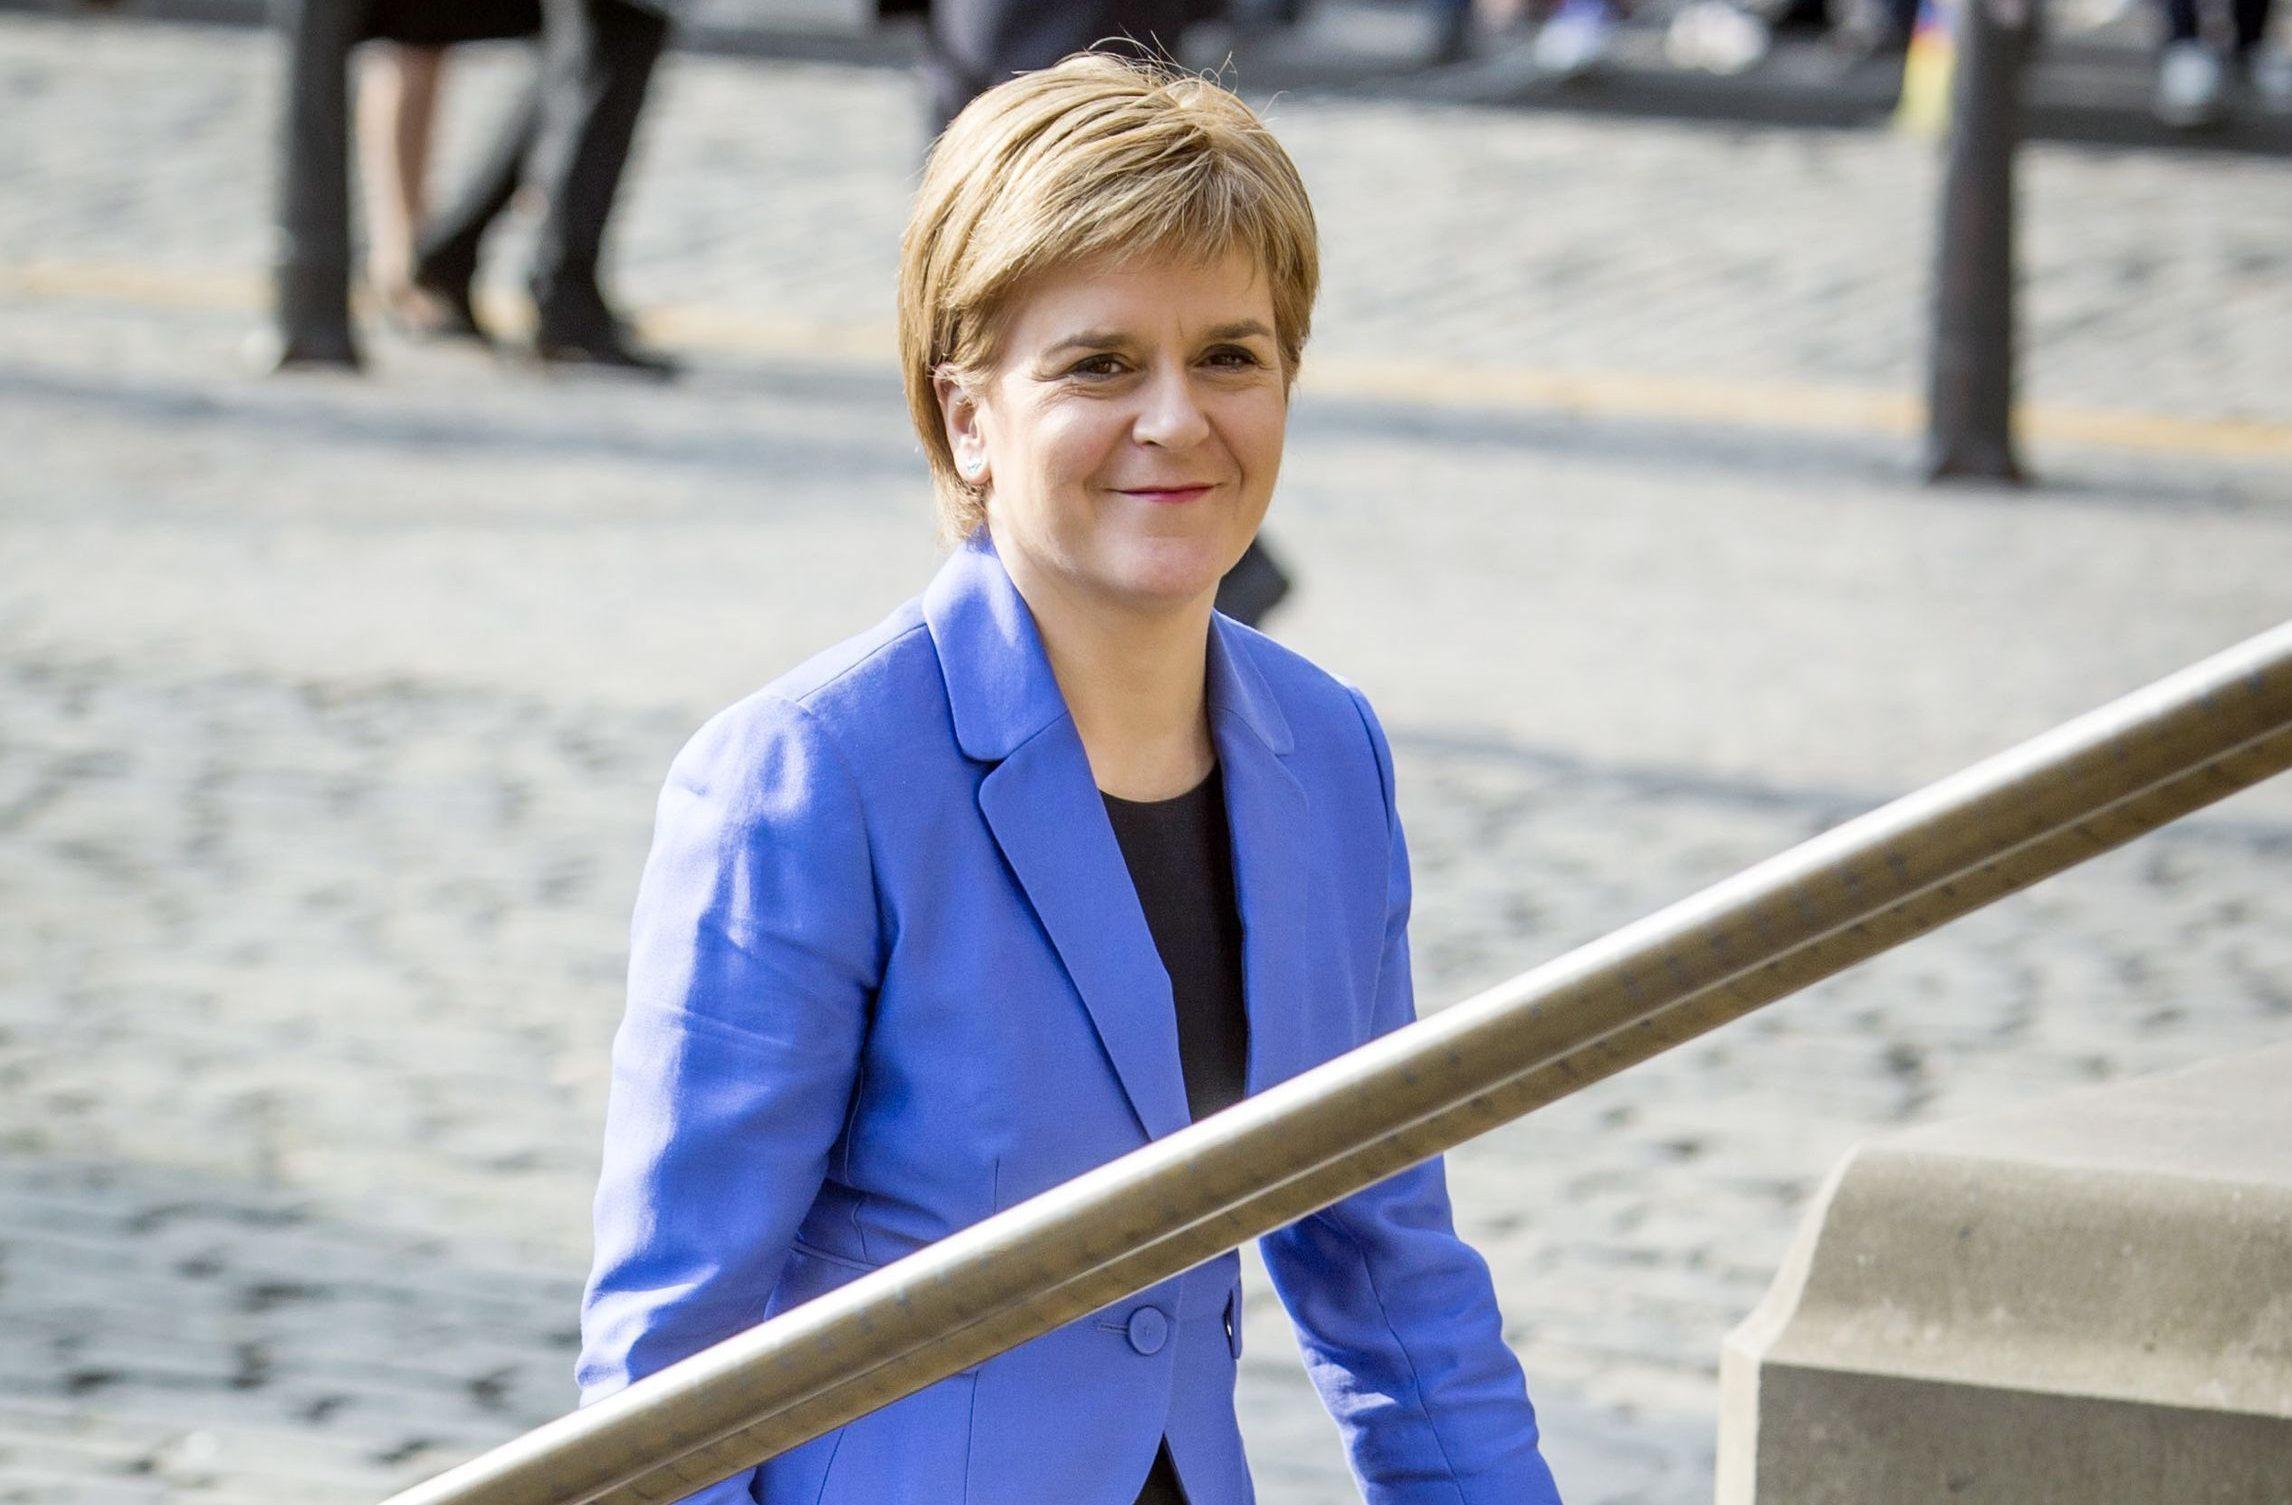 Nicola Sturgeon was swore in before 15 judges.